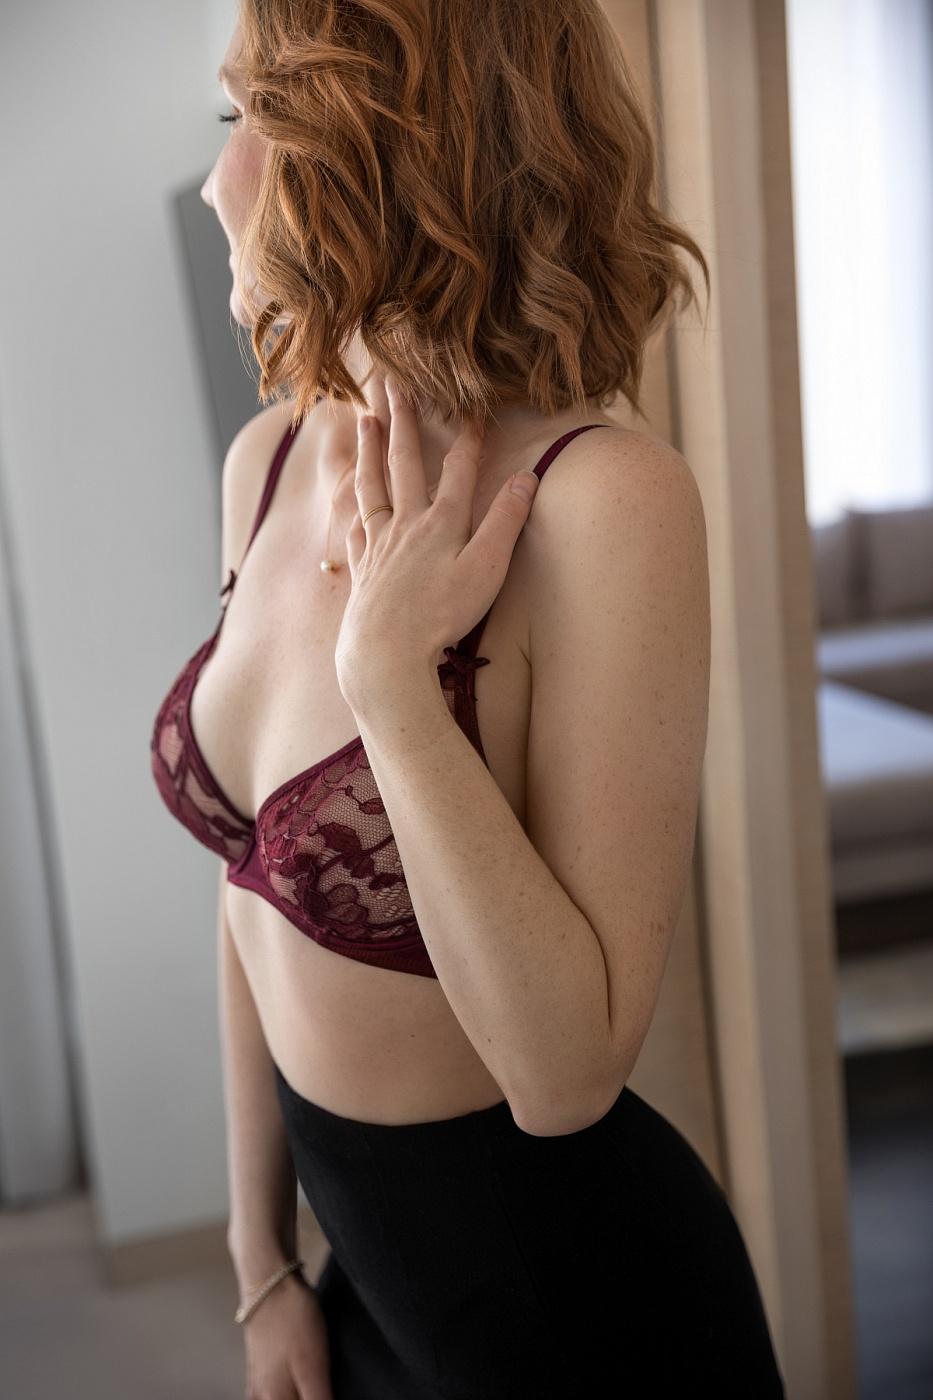 Natalie Byrne